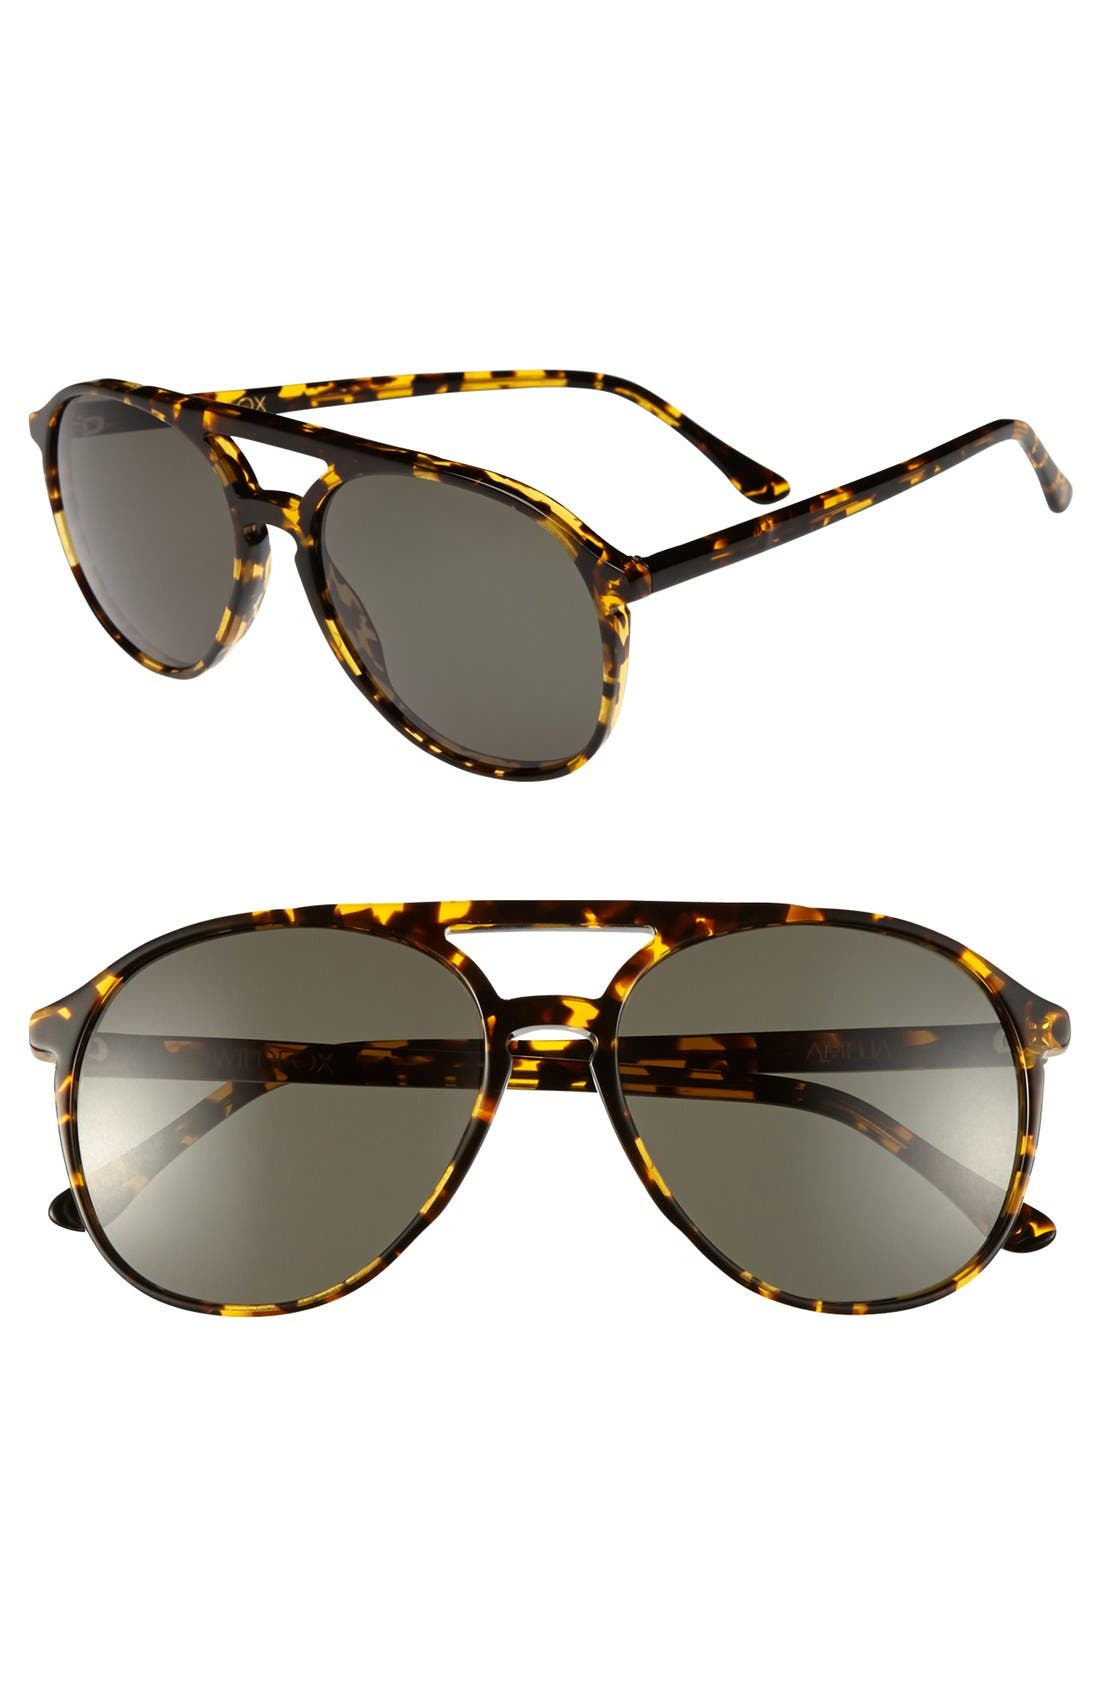 Alternate Image 1 Selected - Wildfox 'Amelia' Sunglasses